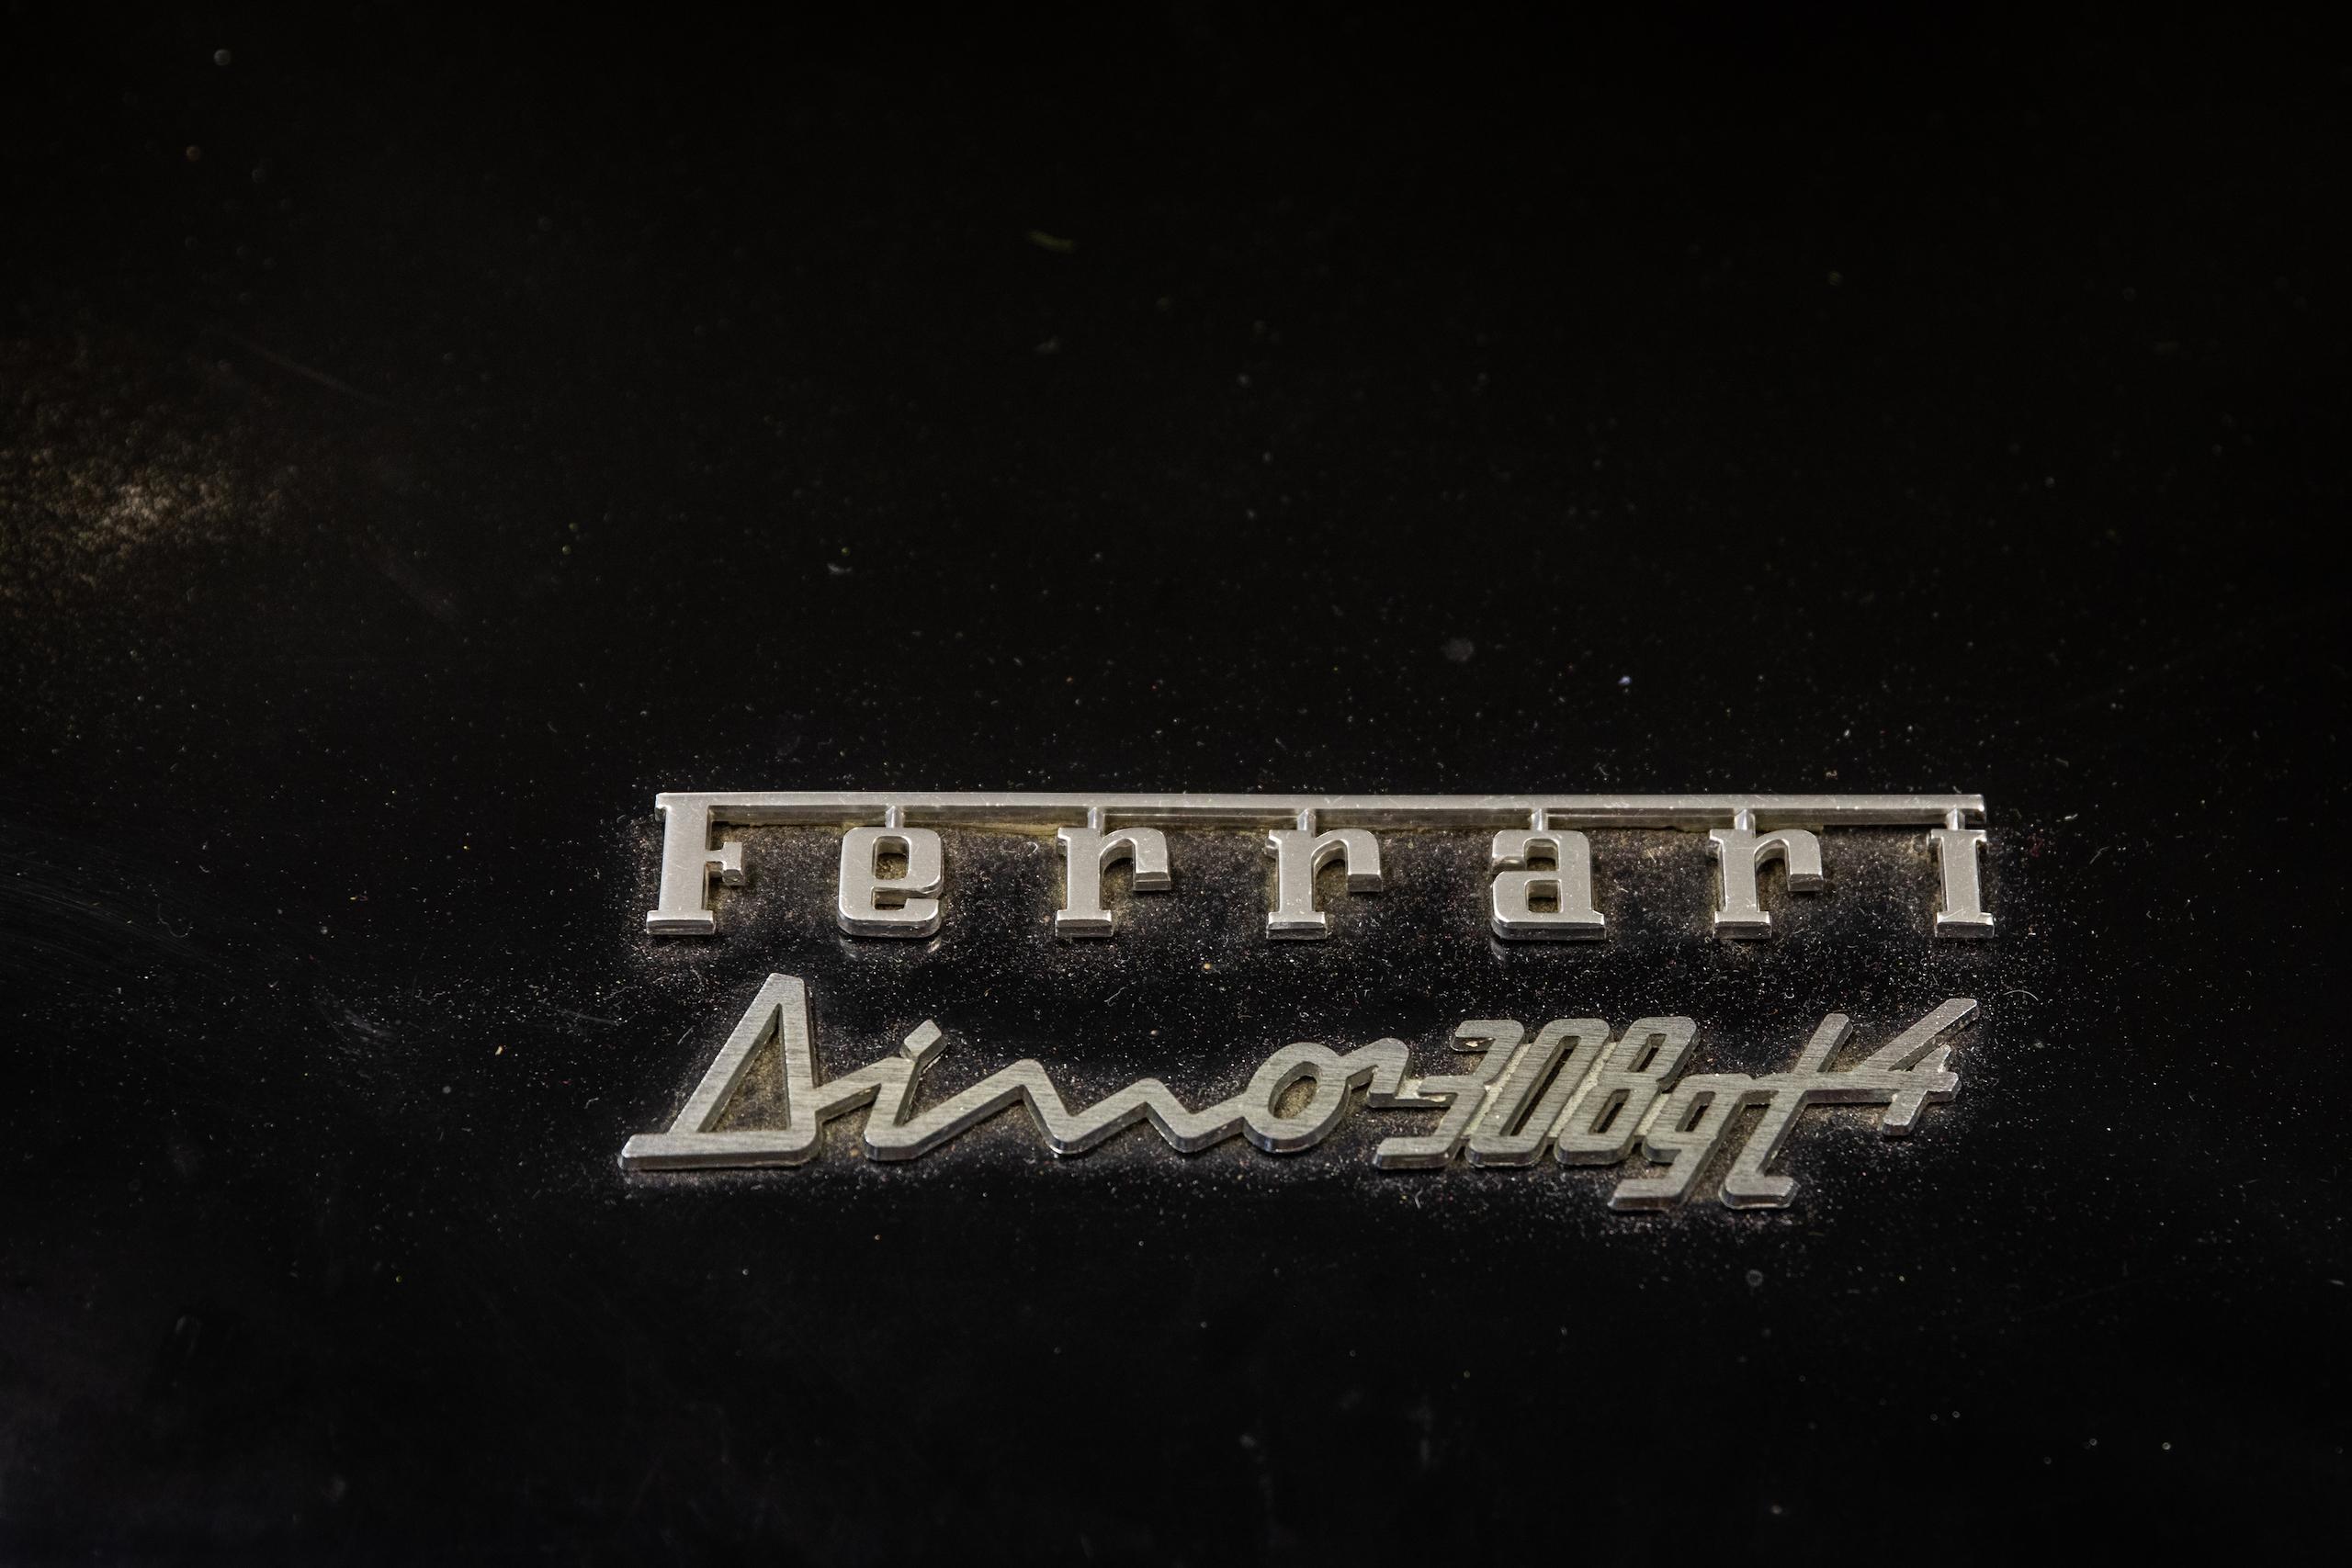 Ferrari Dino badge script lettering